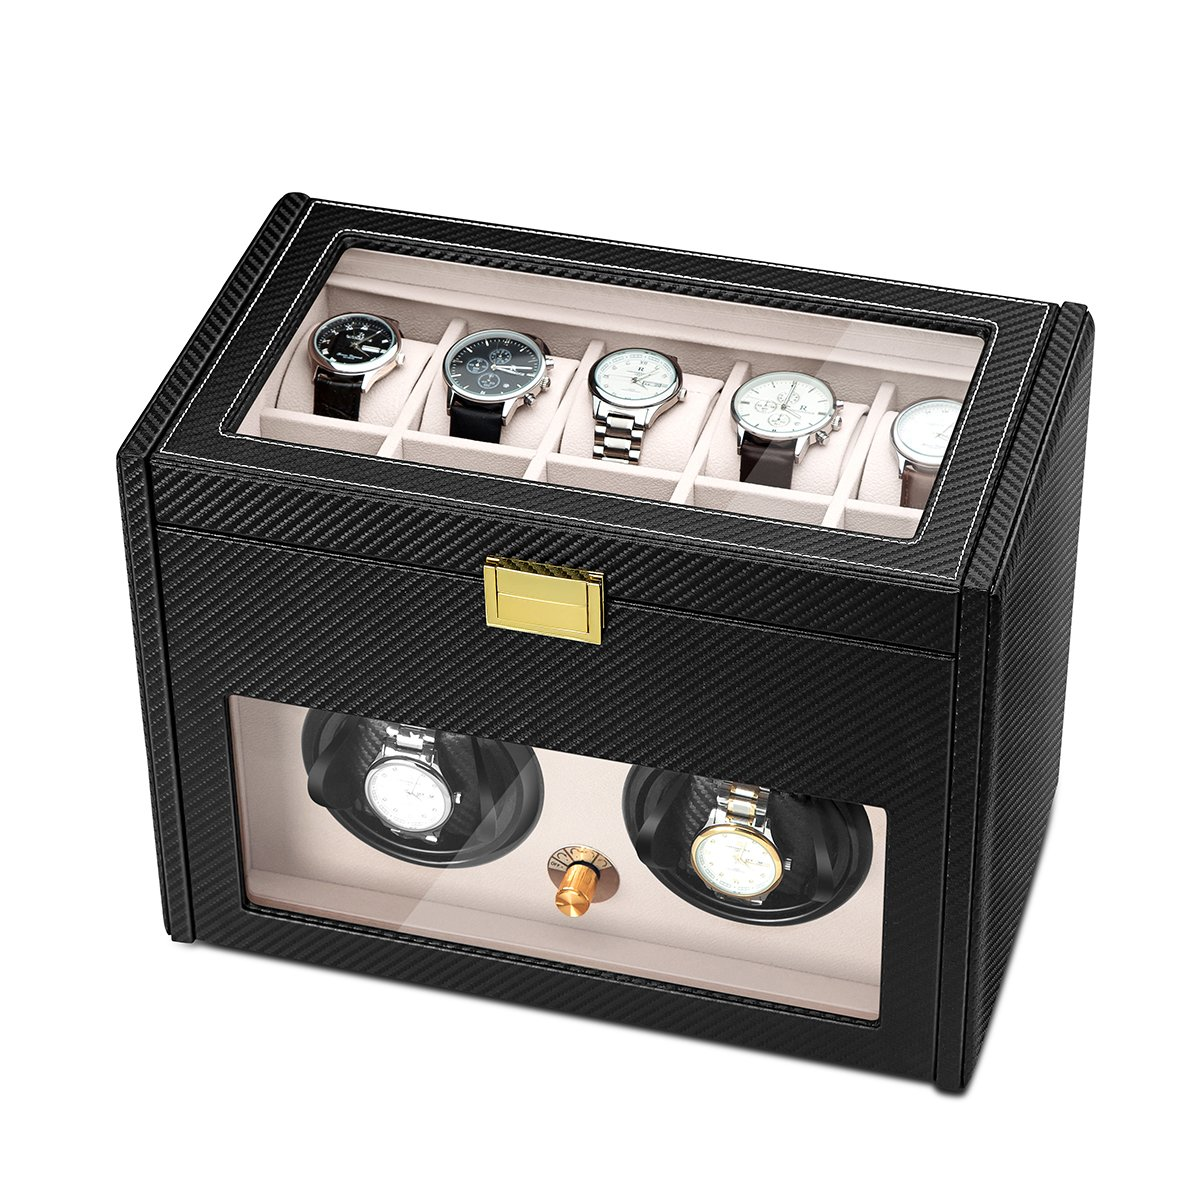 JQUEEN Double Watch Winder with 10 Storages